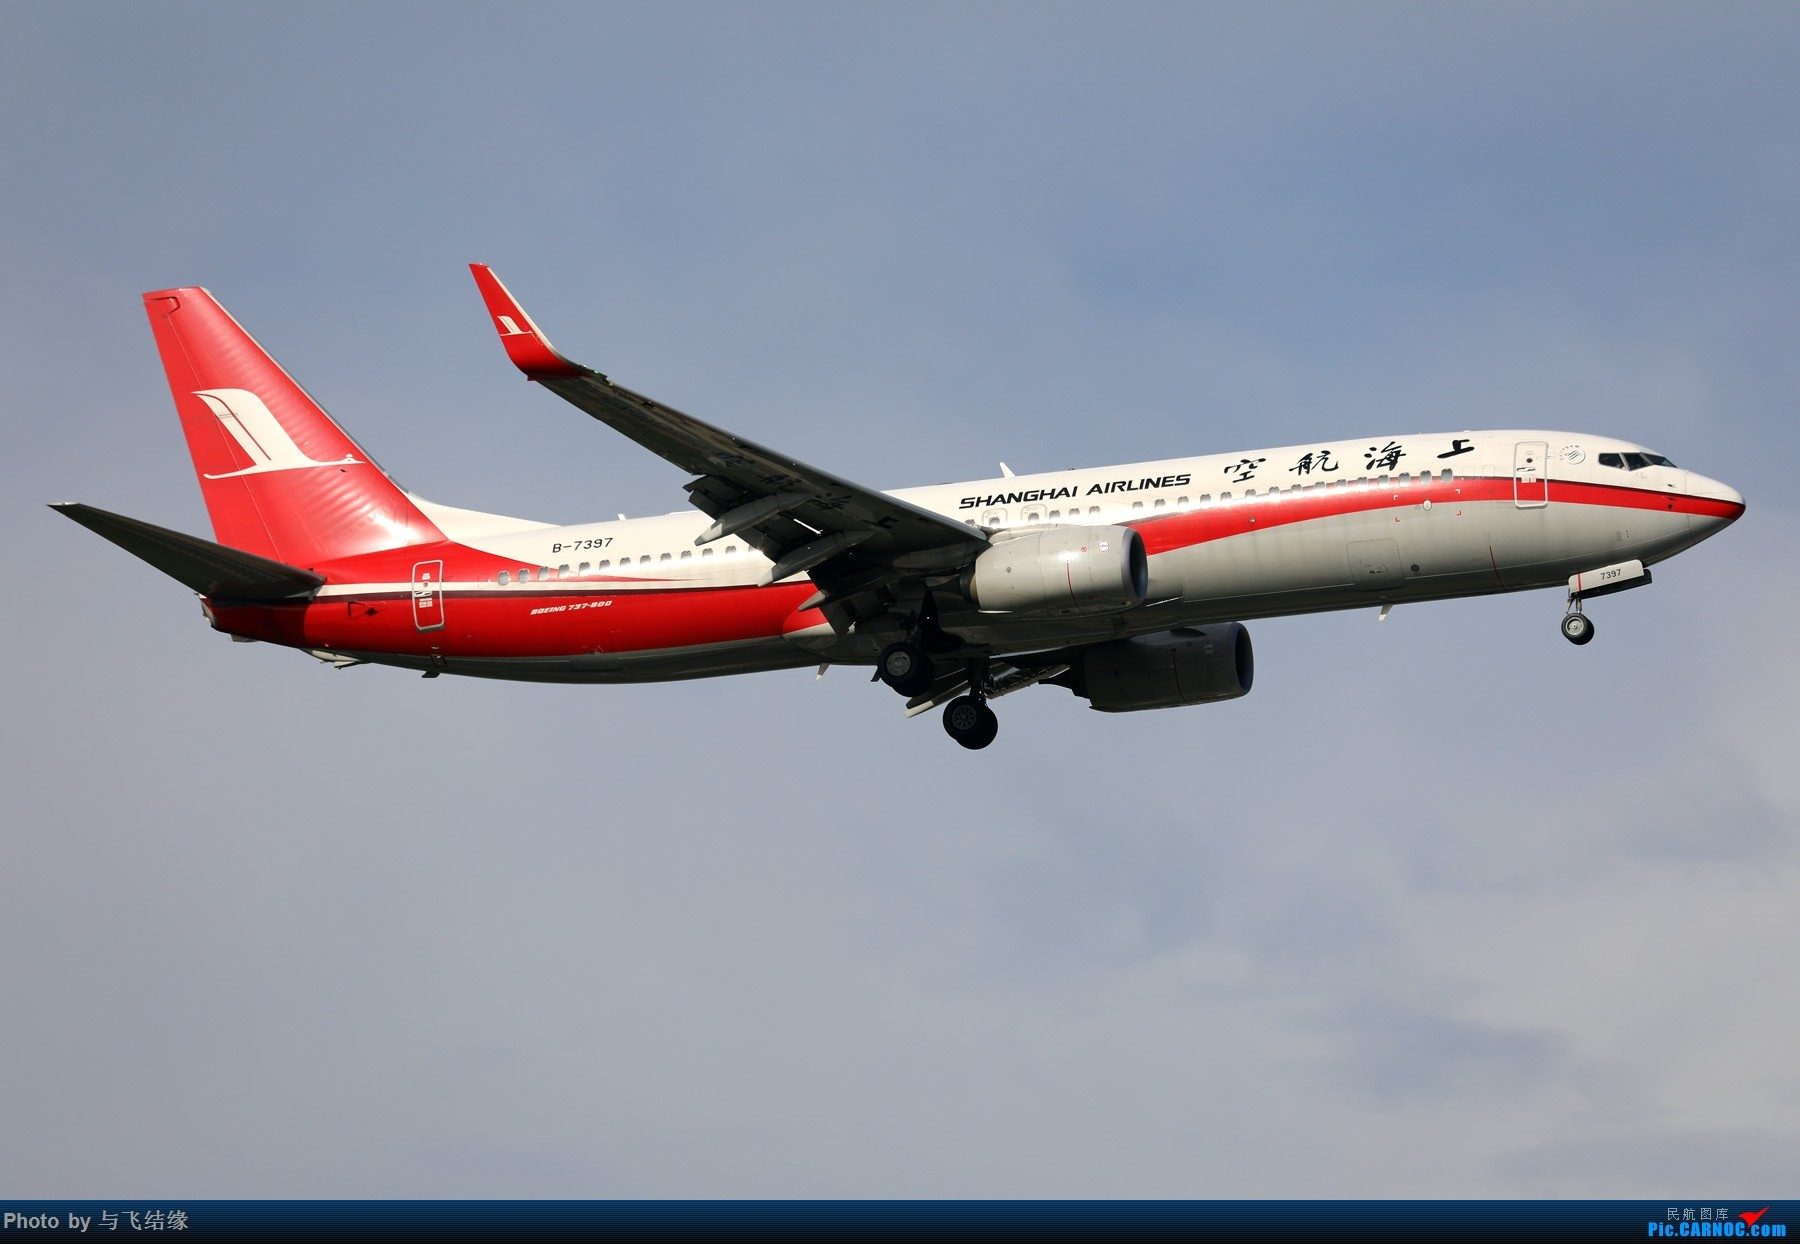 Re:[原创]今日立秋!随便发几张图。 BOEING 737-800 B-7397 中国北京首都国际机场